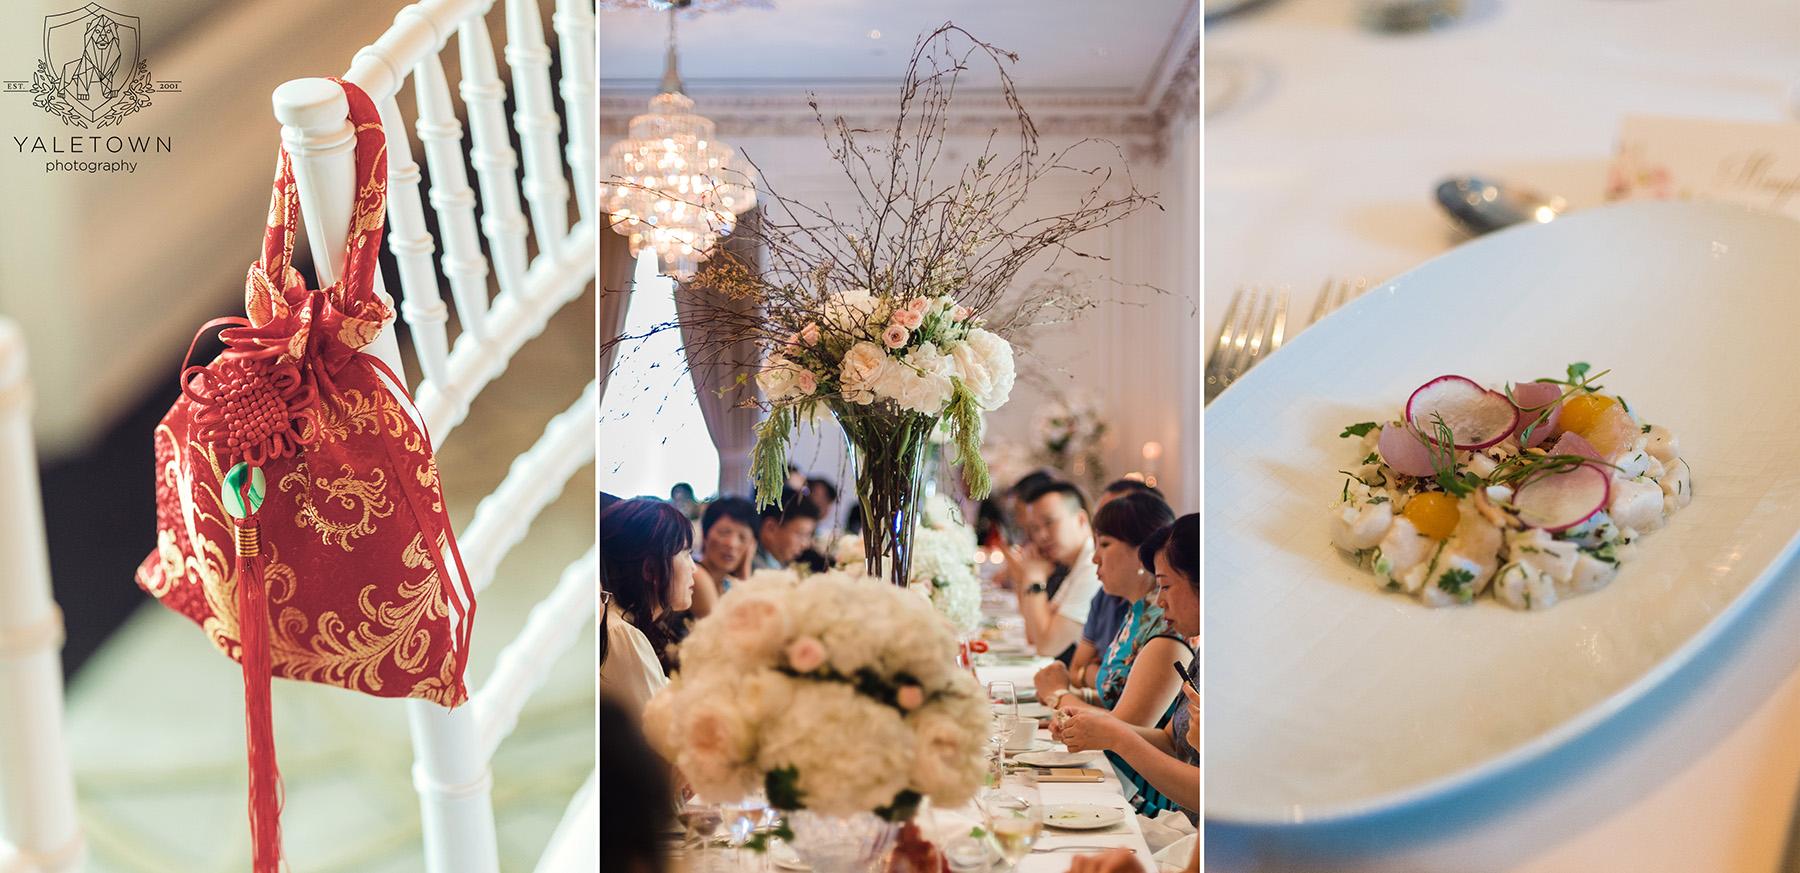 Wedding-Reception-Details-Rosewood-Hotel-Georgia-Vancouver-Wedding-Yaletown-Photography-photo